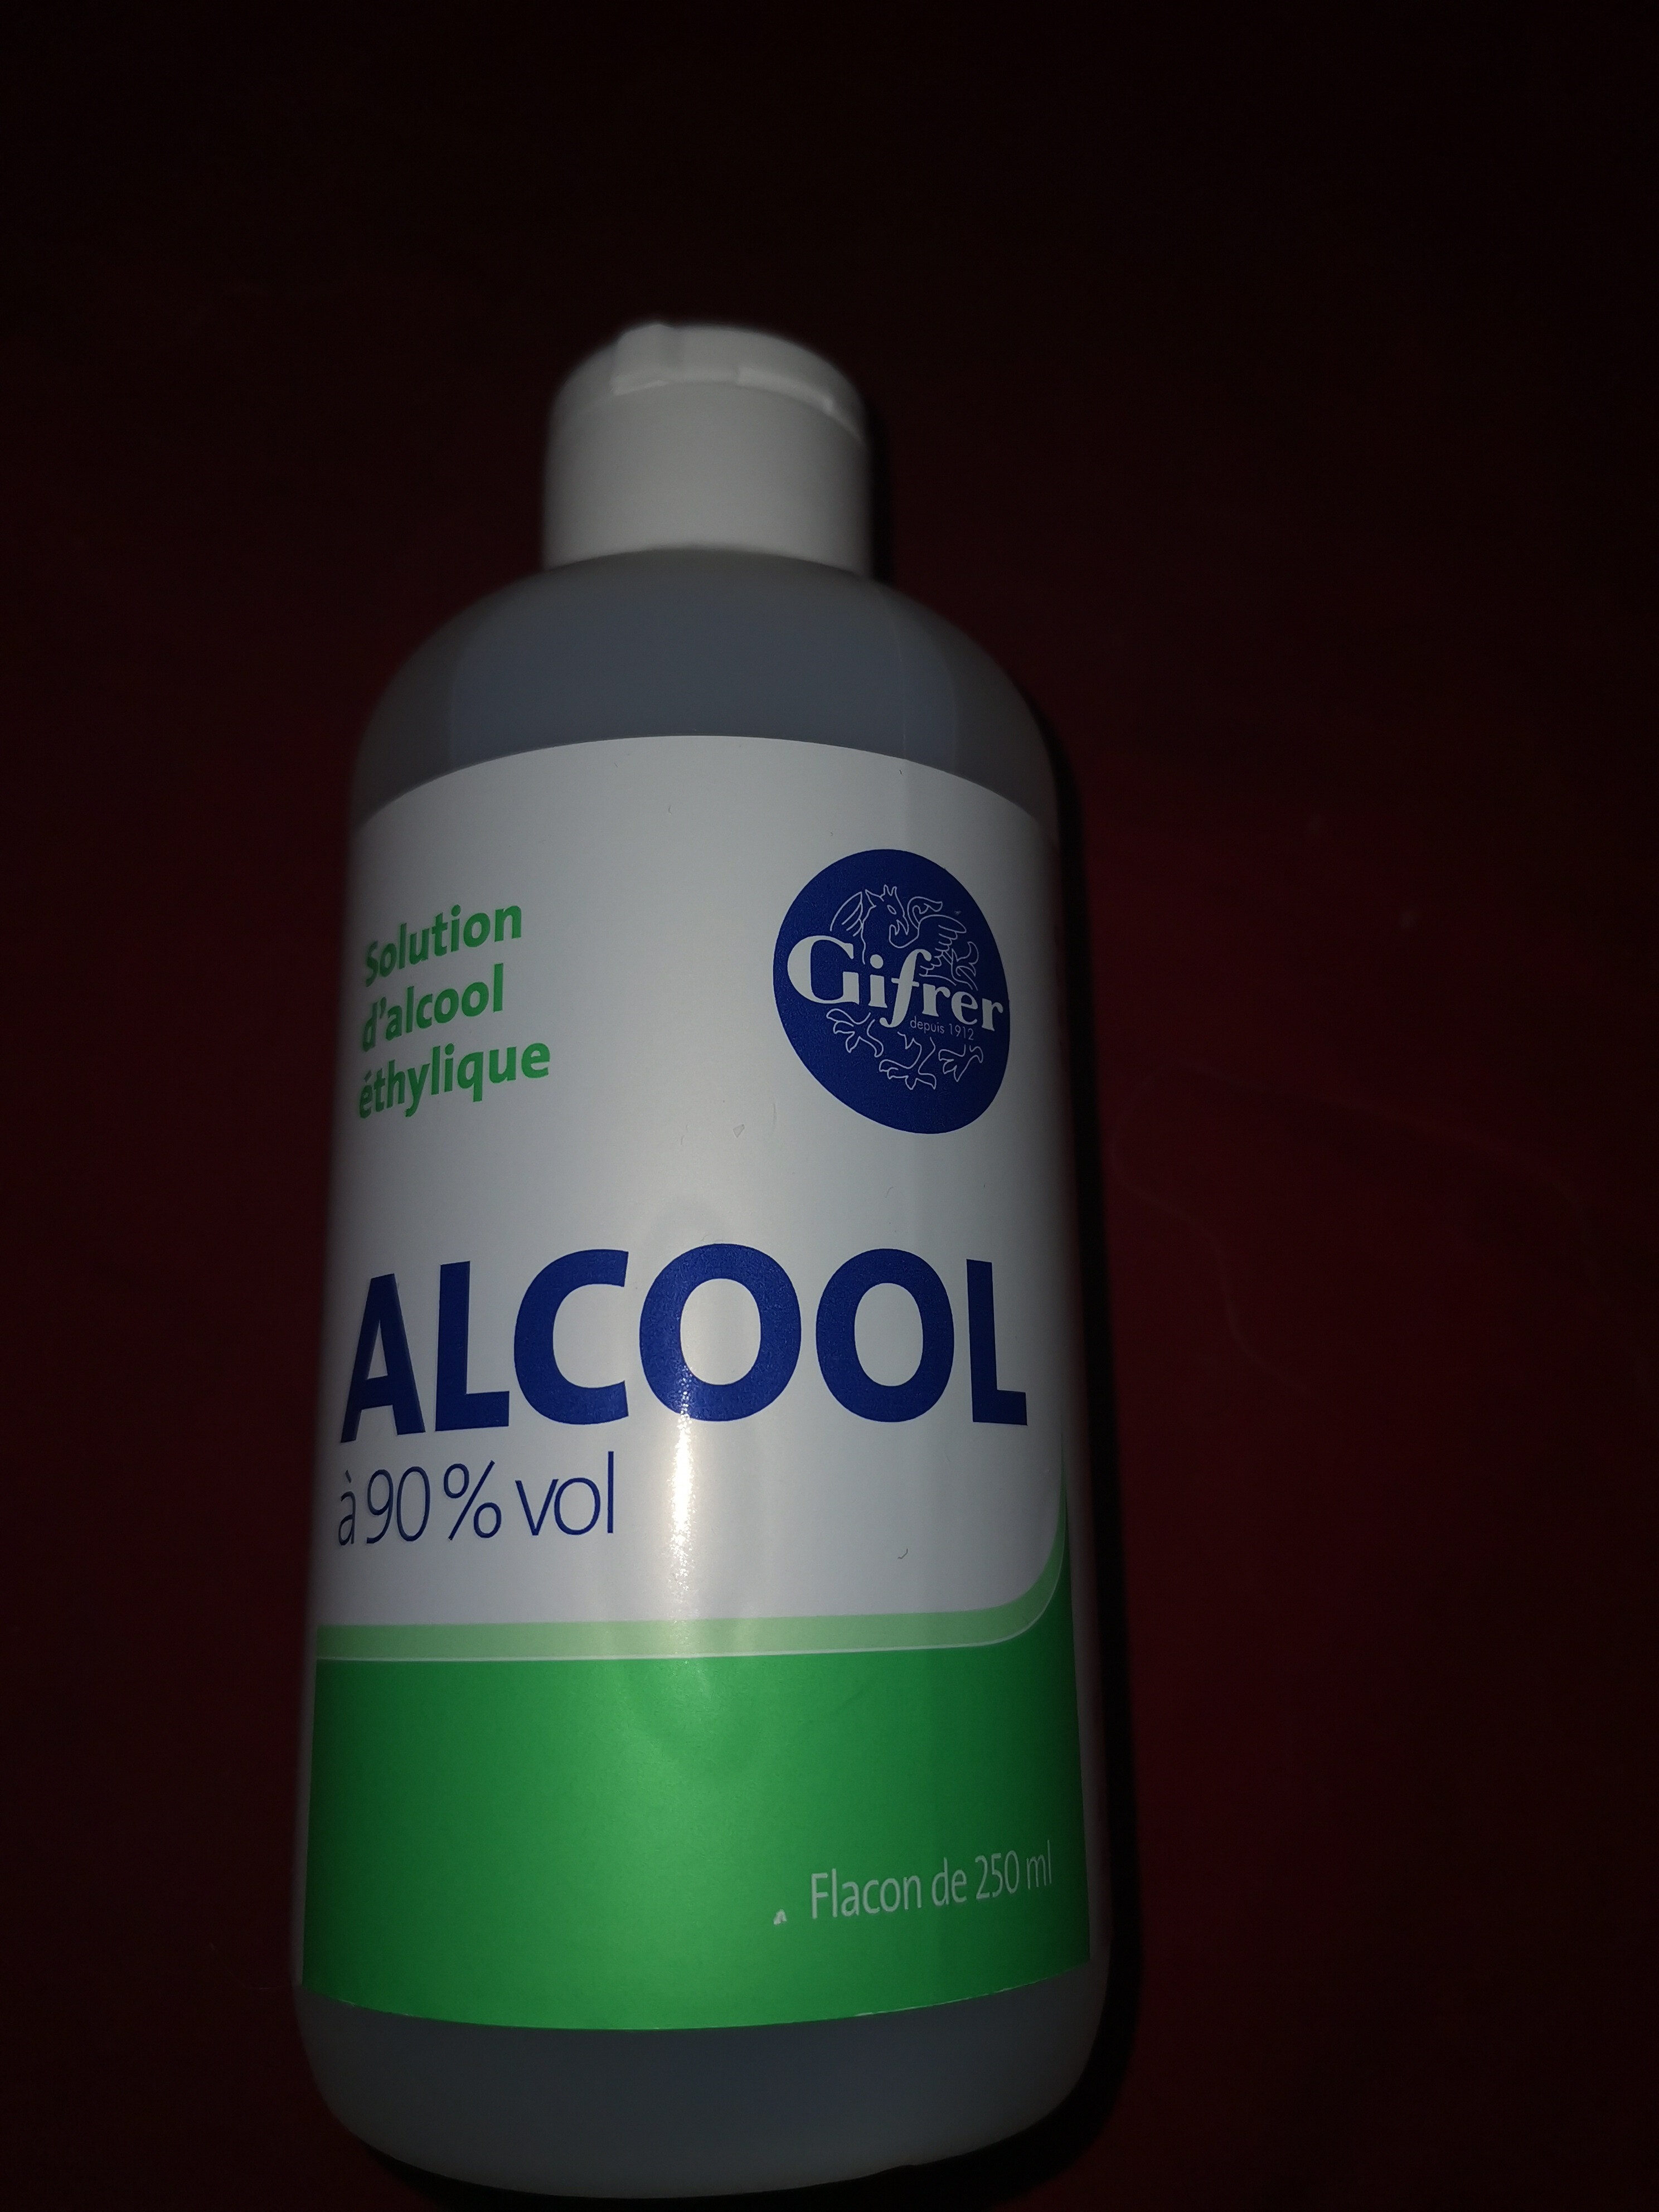 alcool à 90% vol - Ingredients - fr